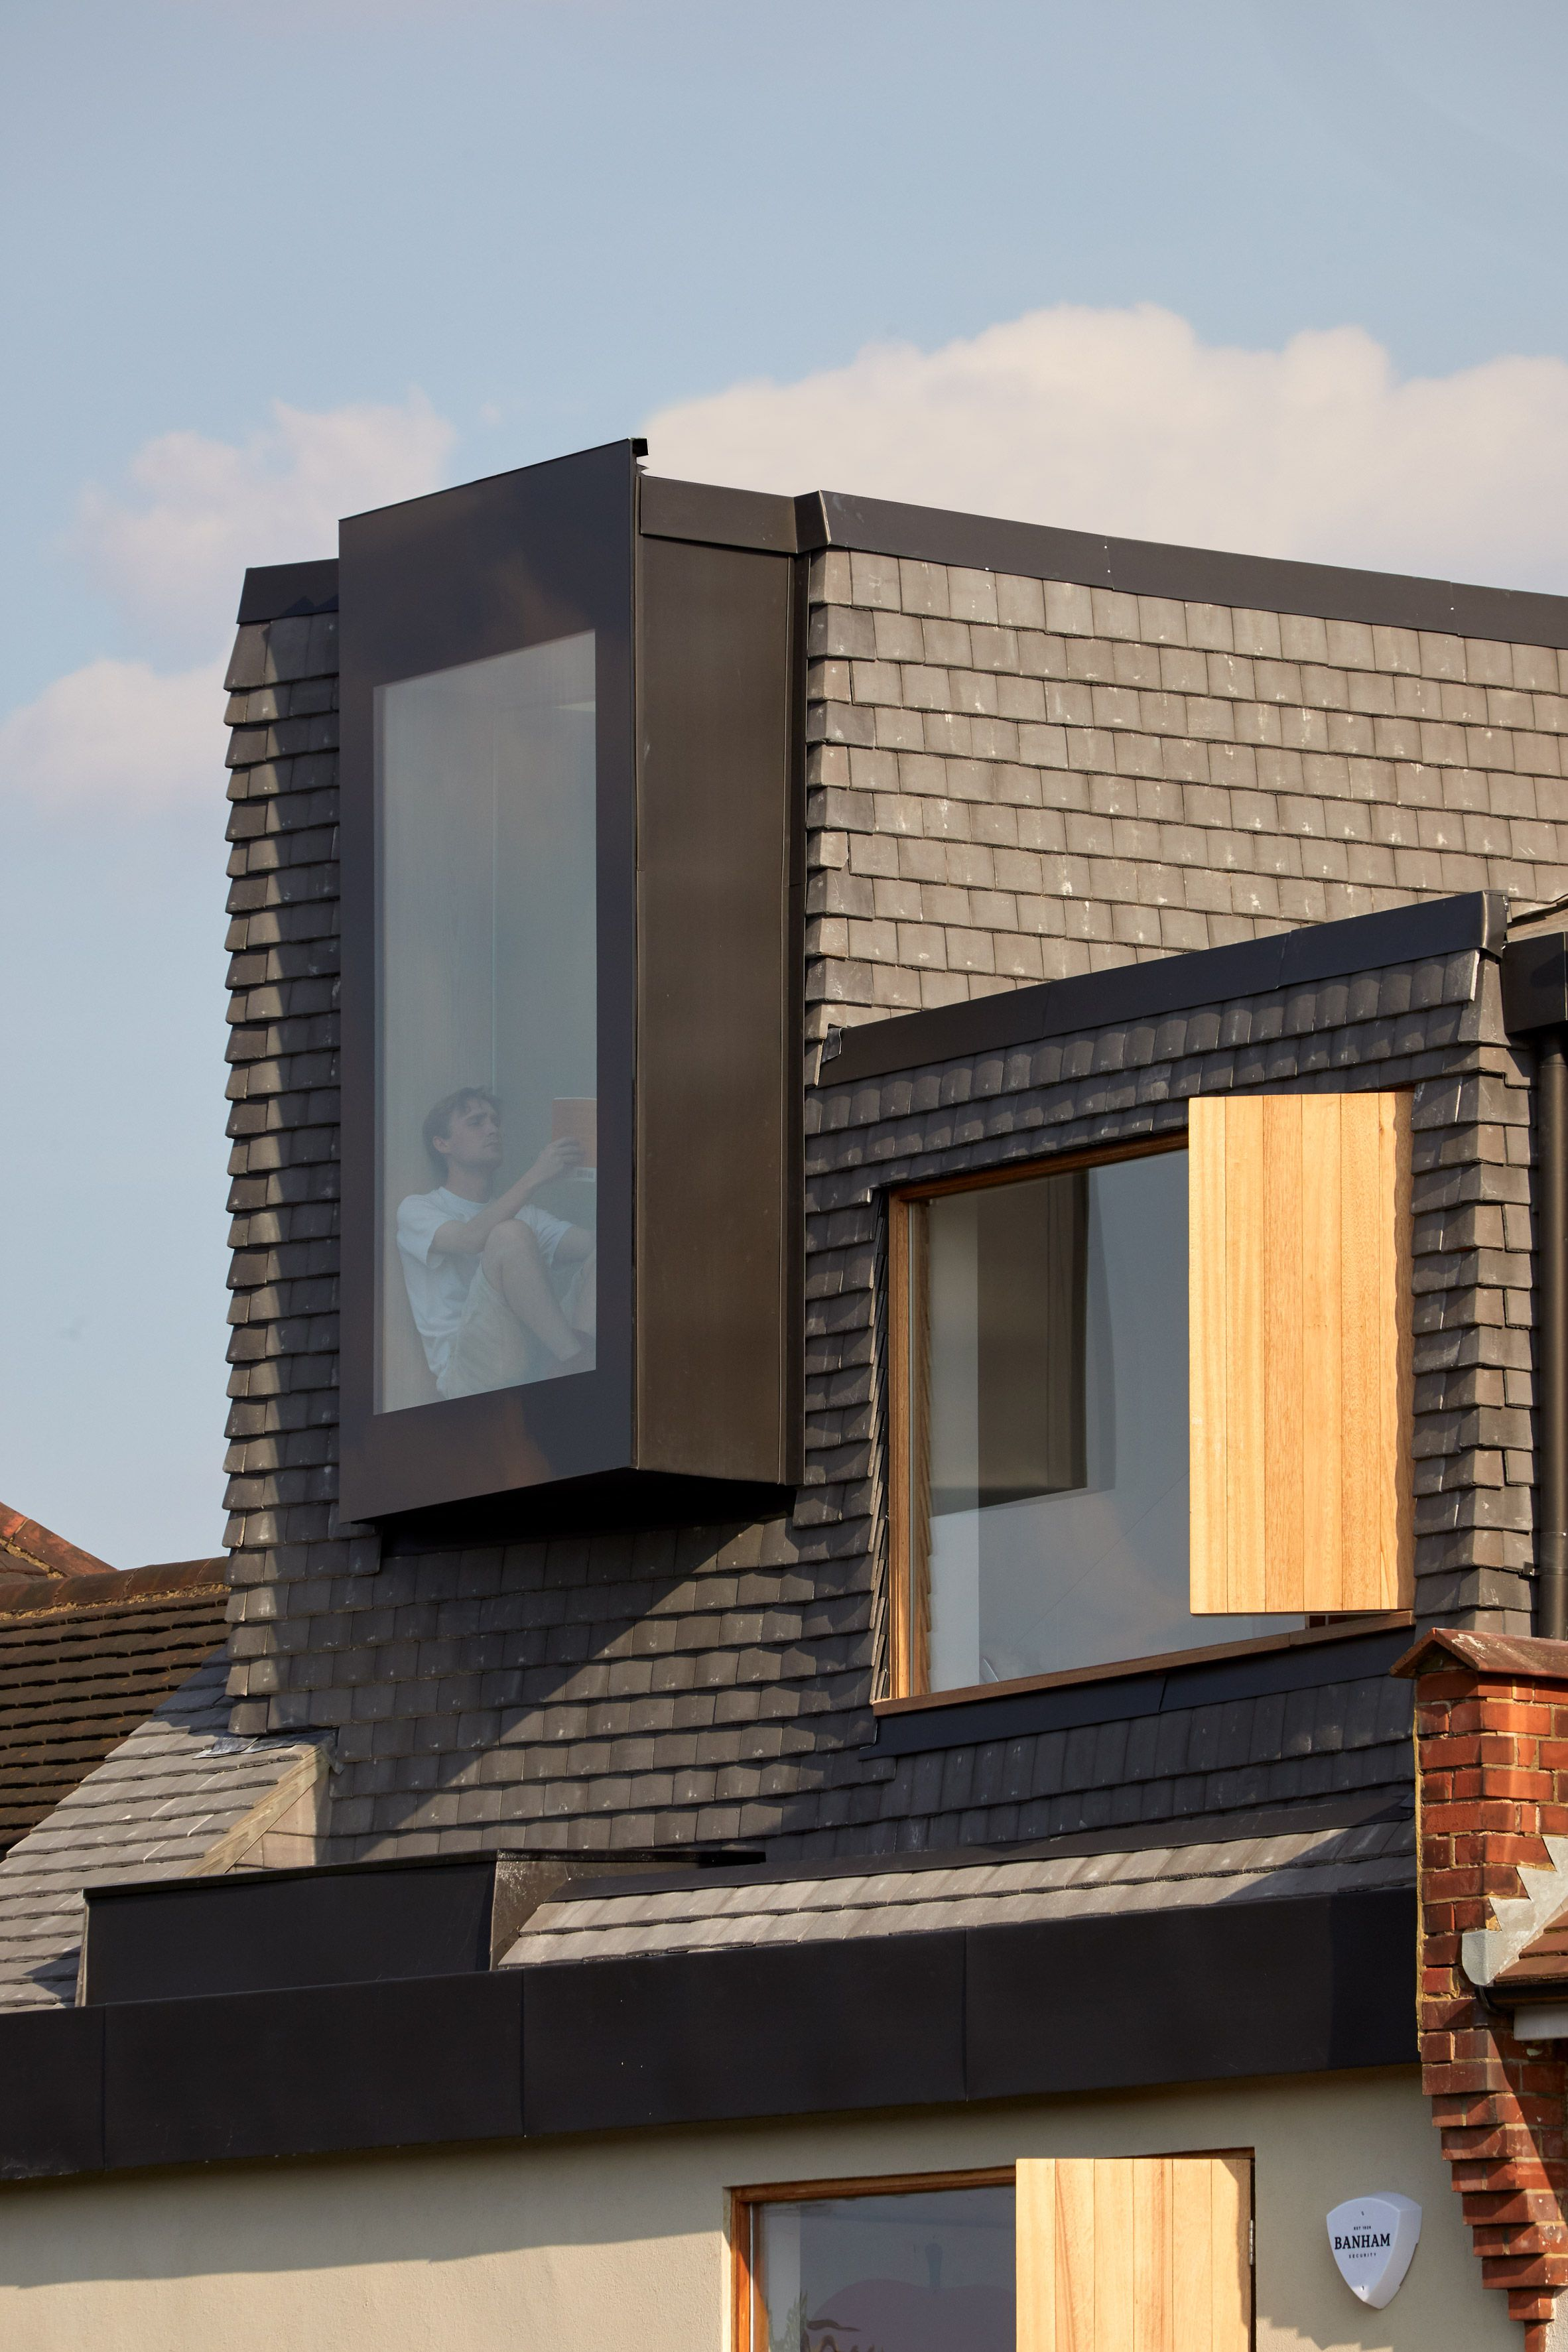 Concrete Roof Tiles Cover The New Exterior Of Douglas House S Upper Level Douglas House House Cladding London House